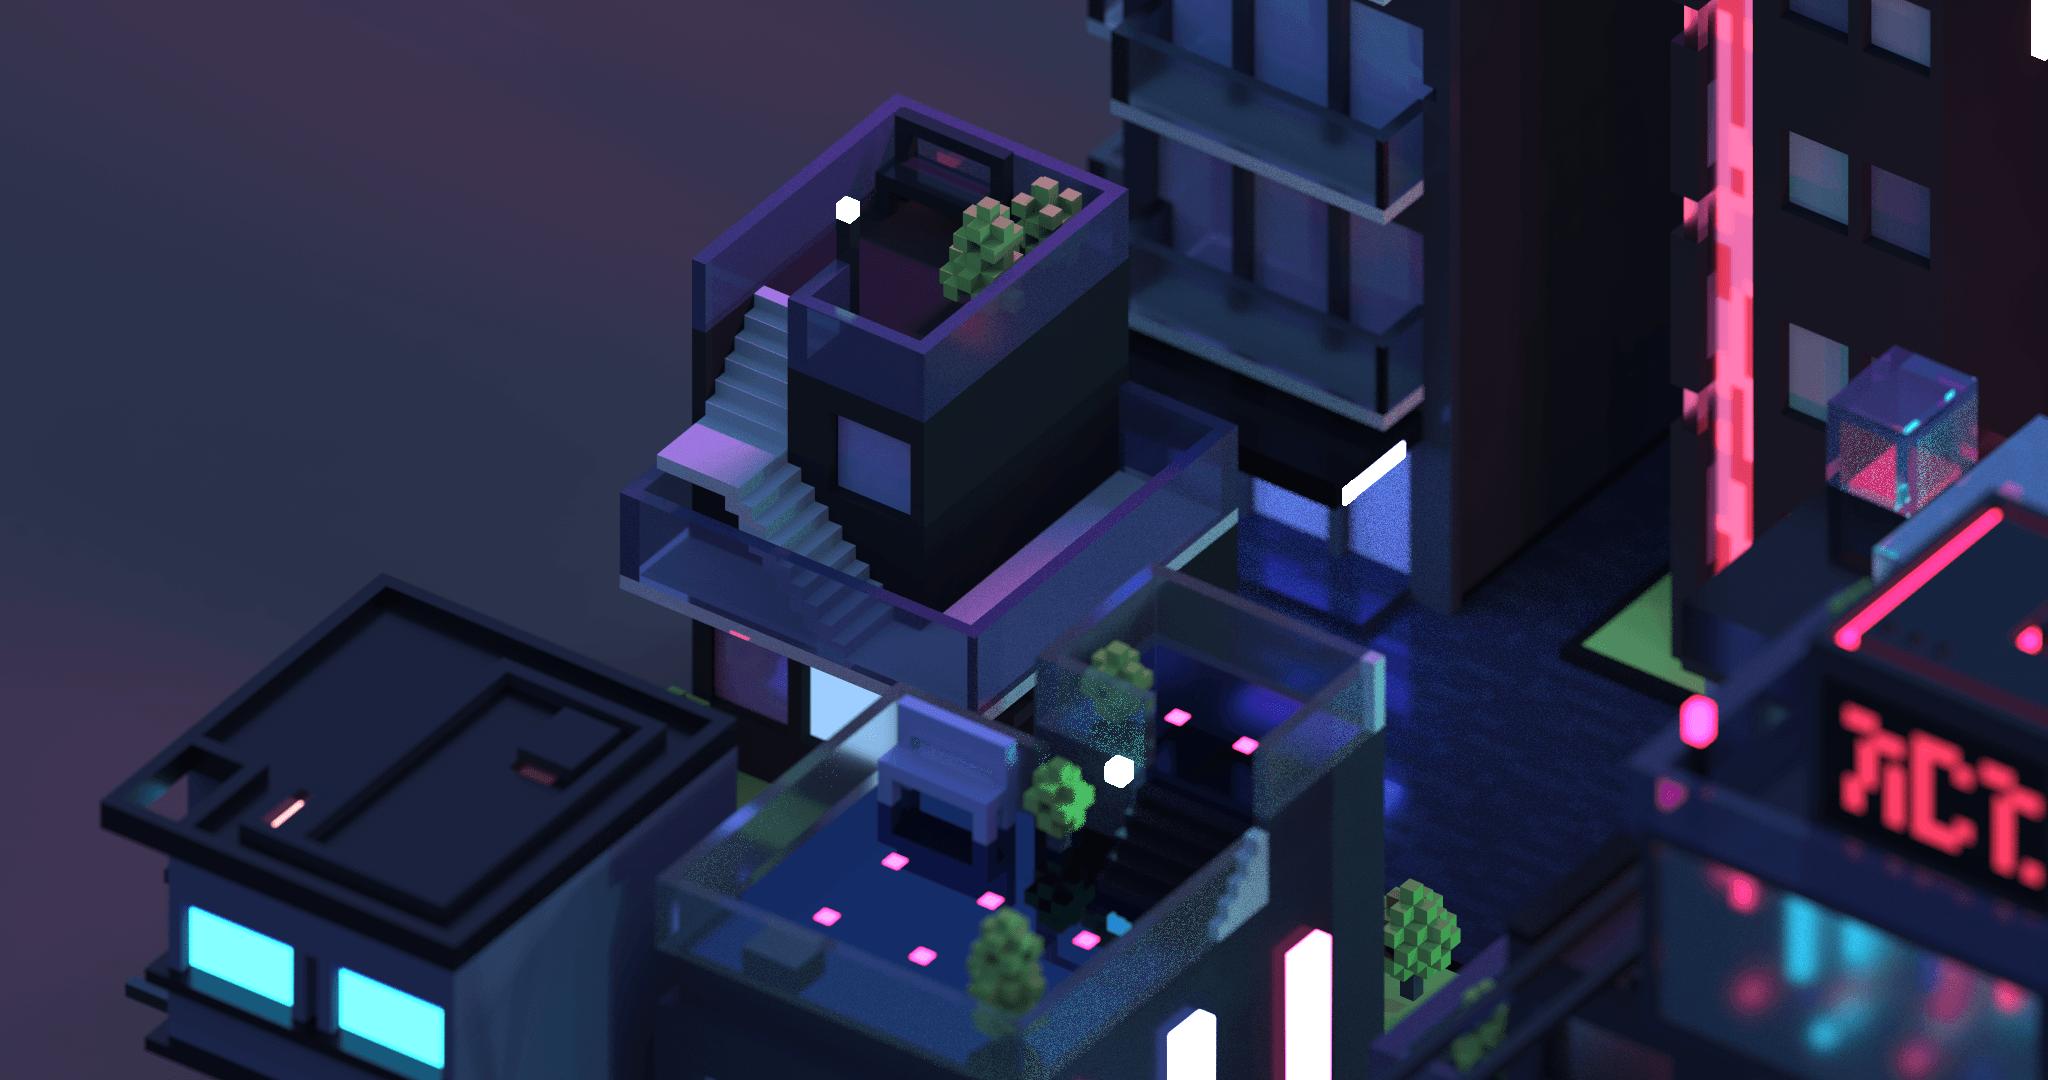 Neon City – 3D isometric voxel | Meg Wehrlen